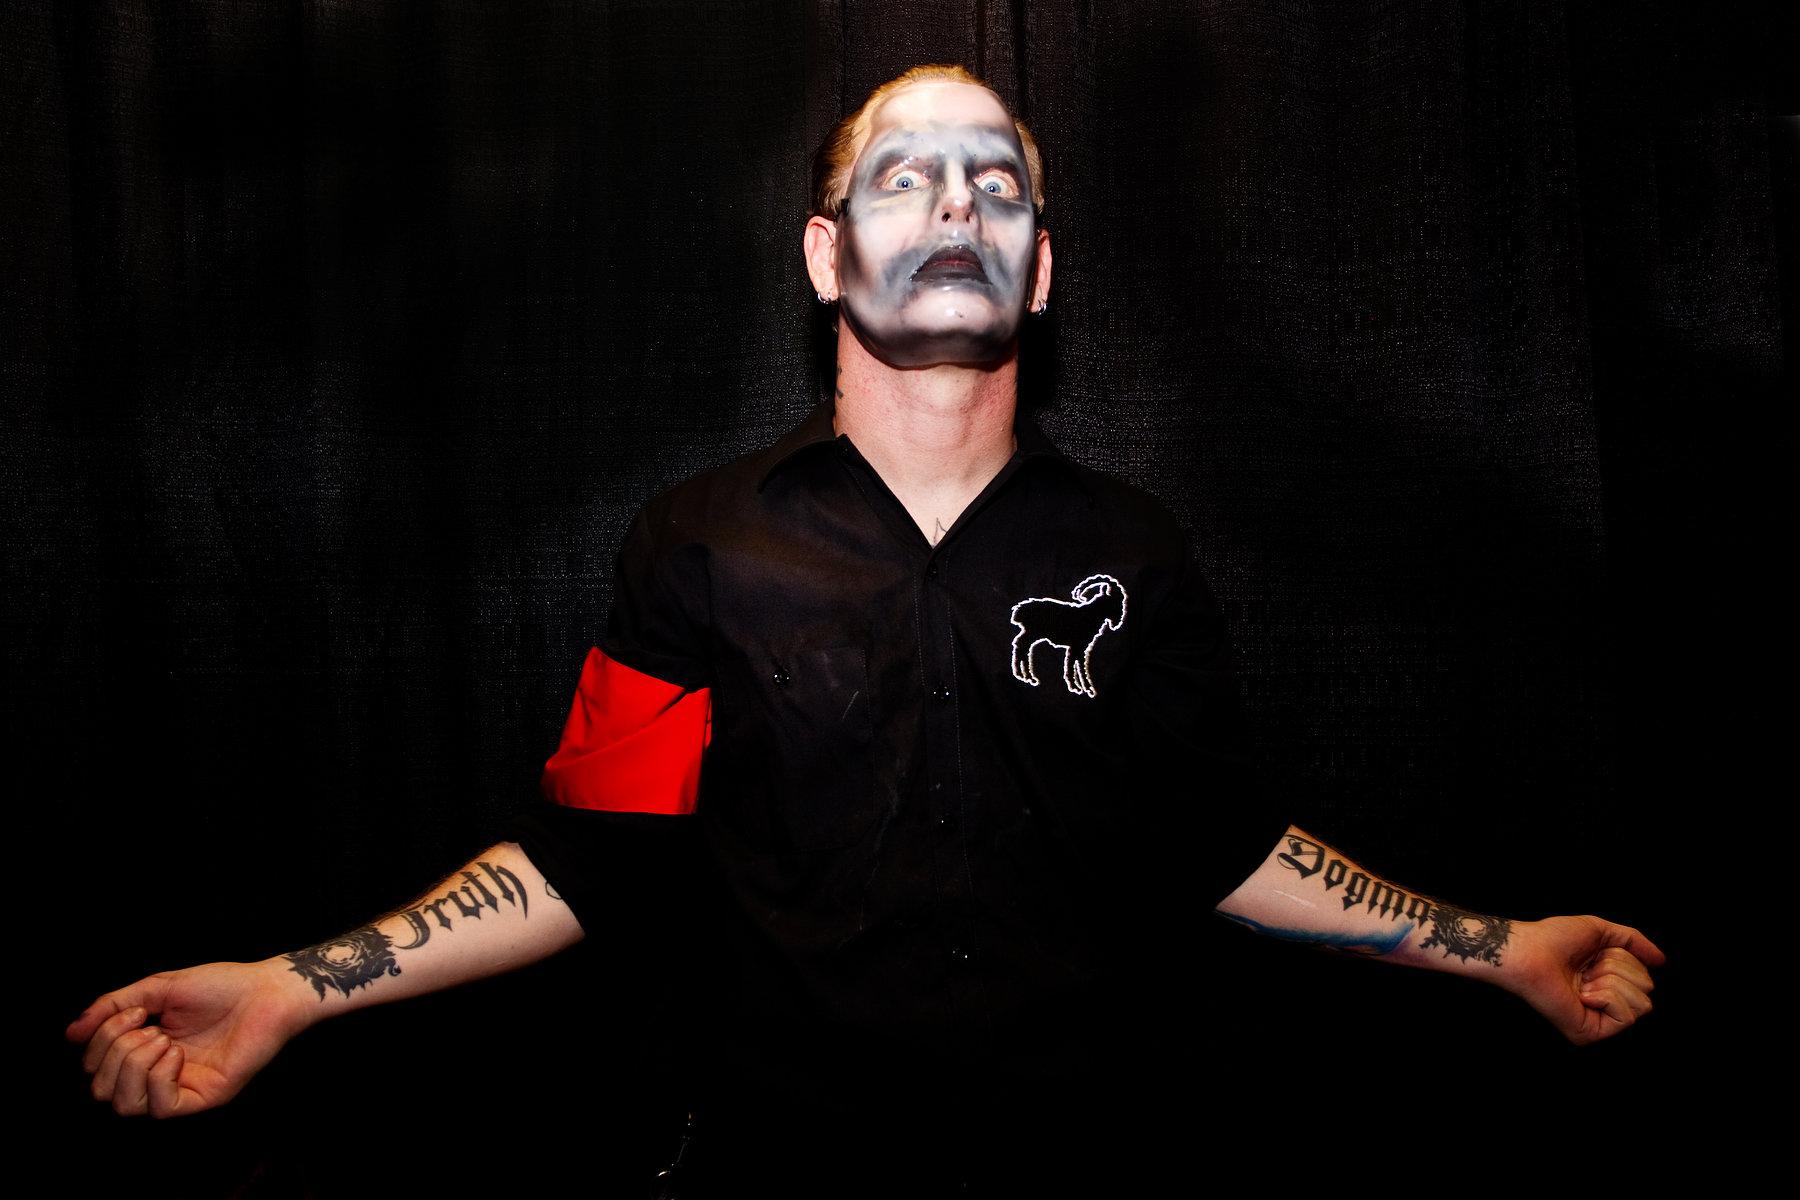 Corey-Slipknot